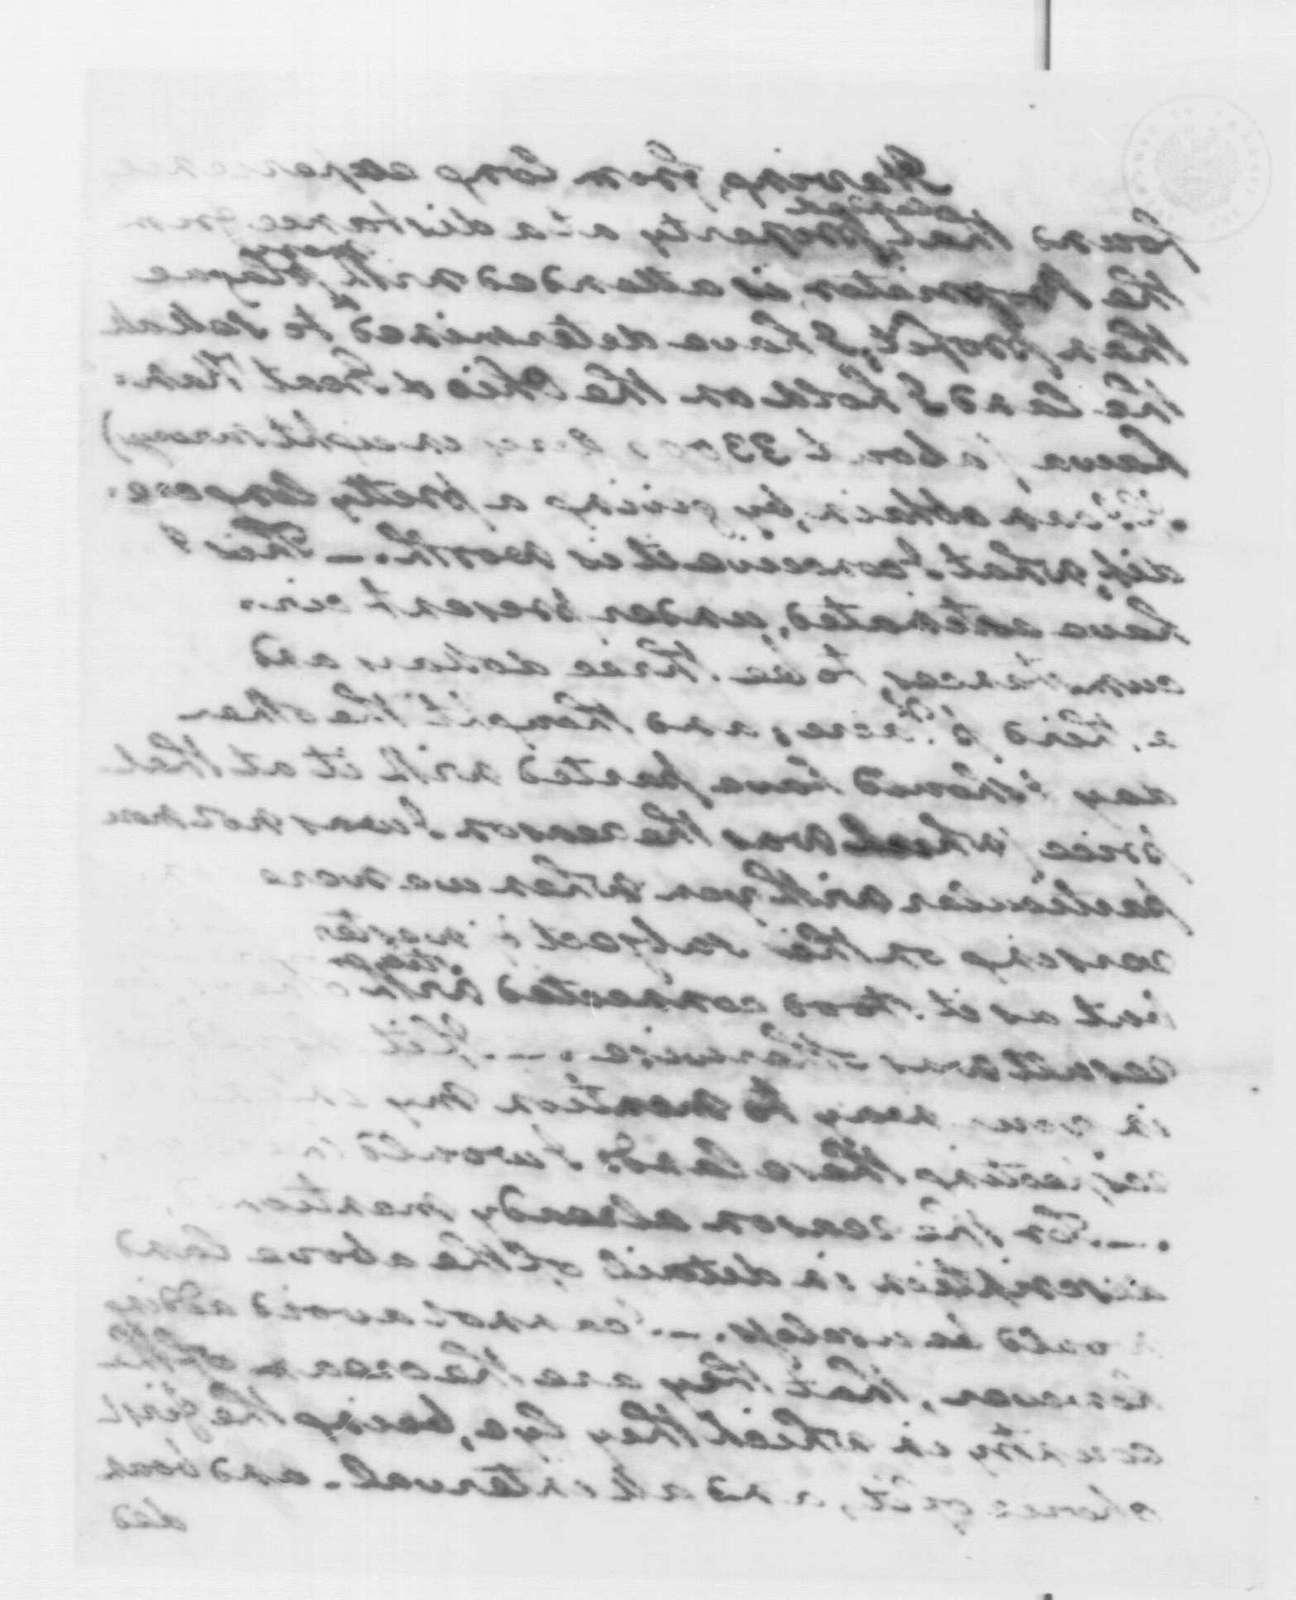 George Washington Papers, Series 4, General Correspondence: George Washington to James Ross, June 16, 1794